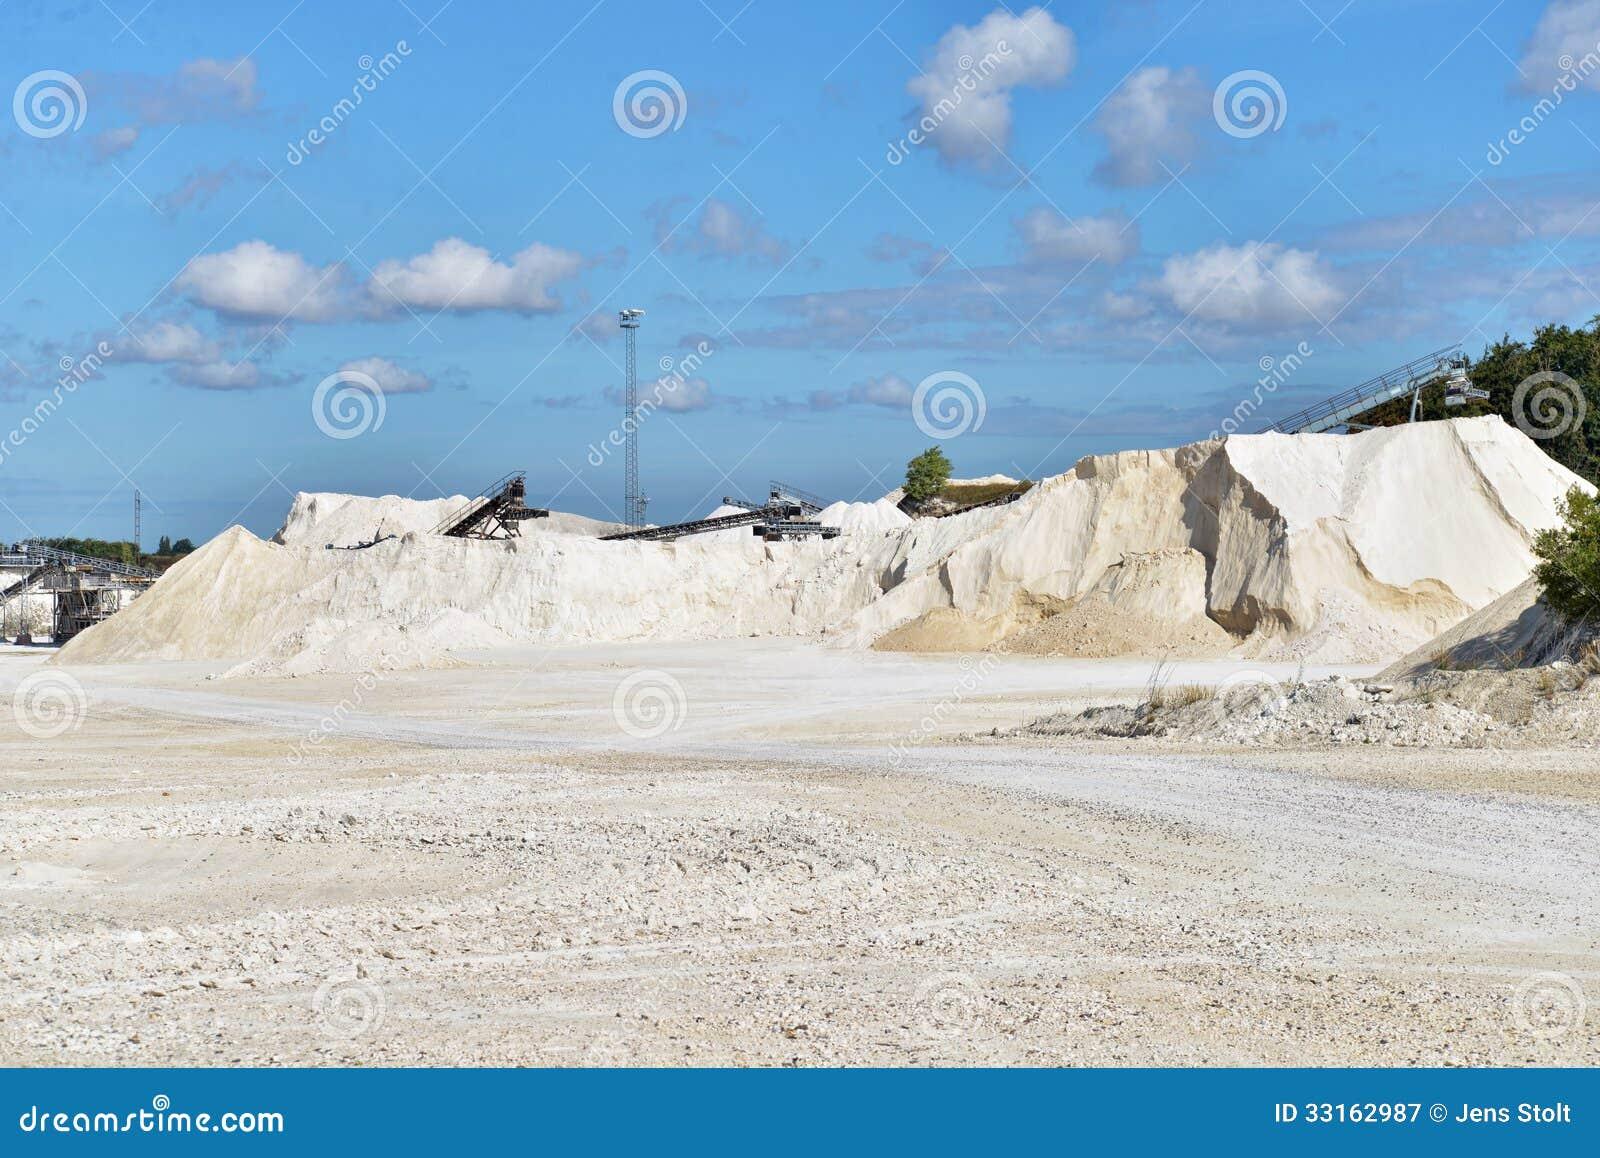 quarry business plan